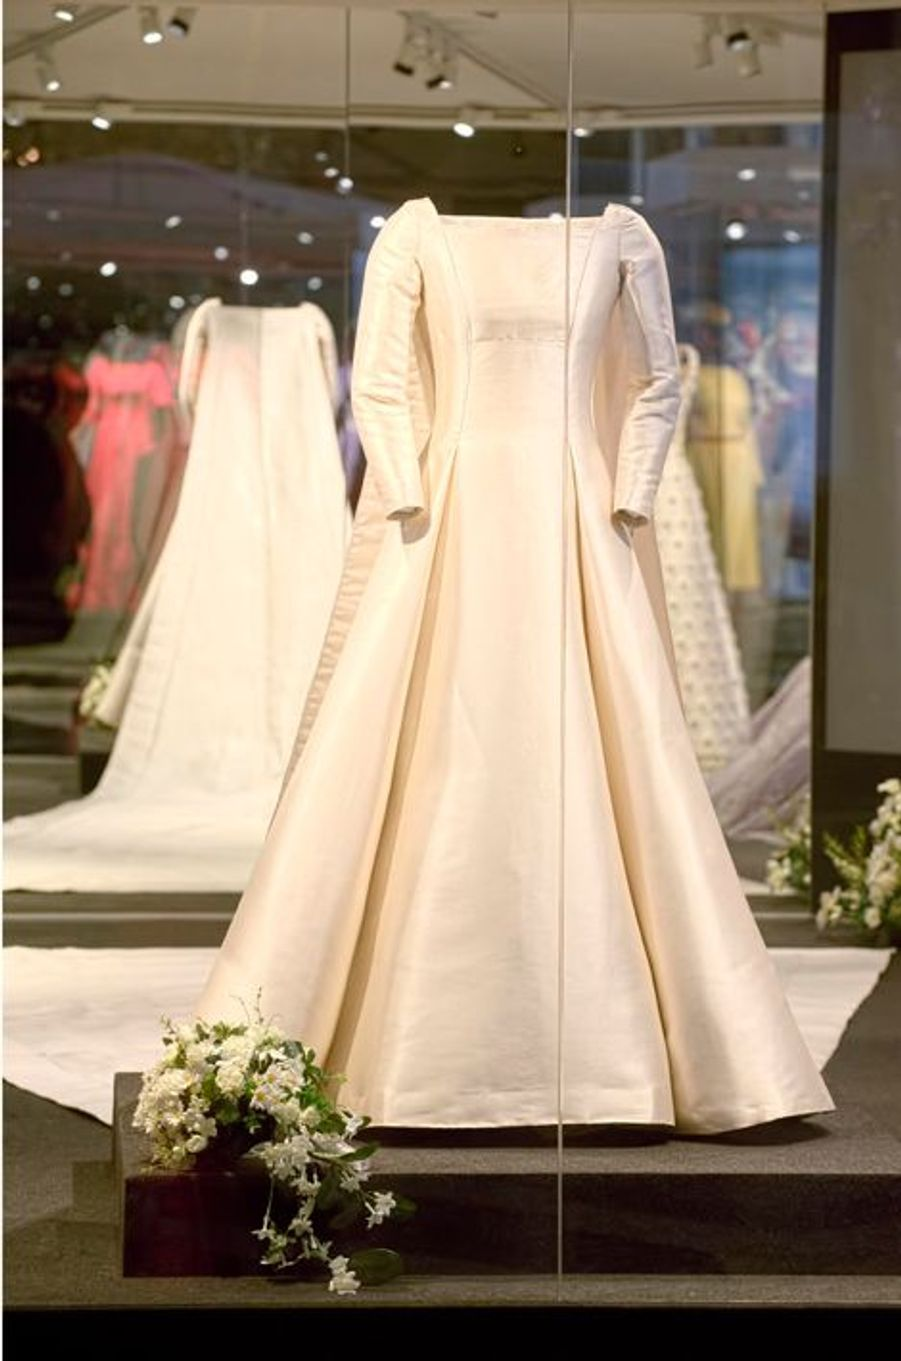 La robe de mariée de la reine Margrethe II exposée à Hillerod, le 25 mars 2015